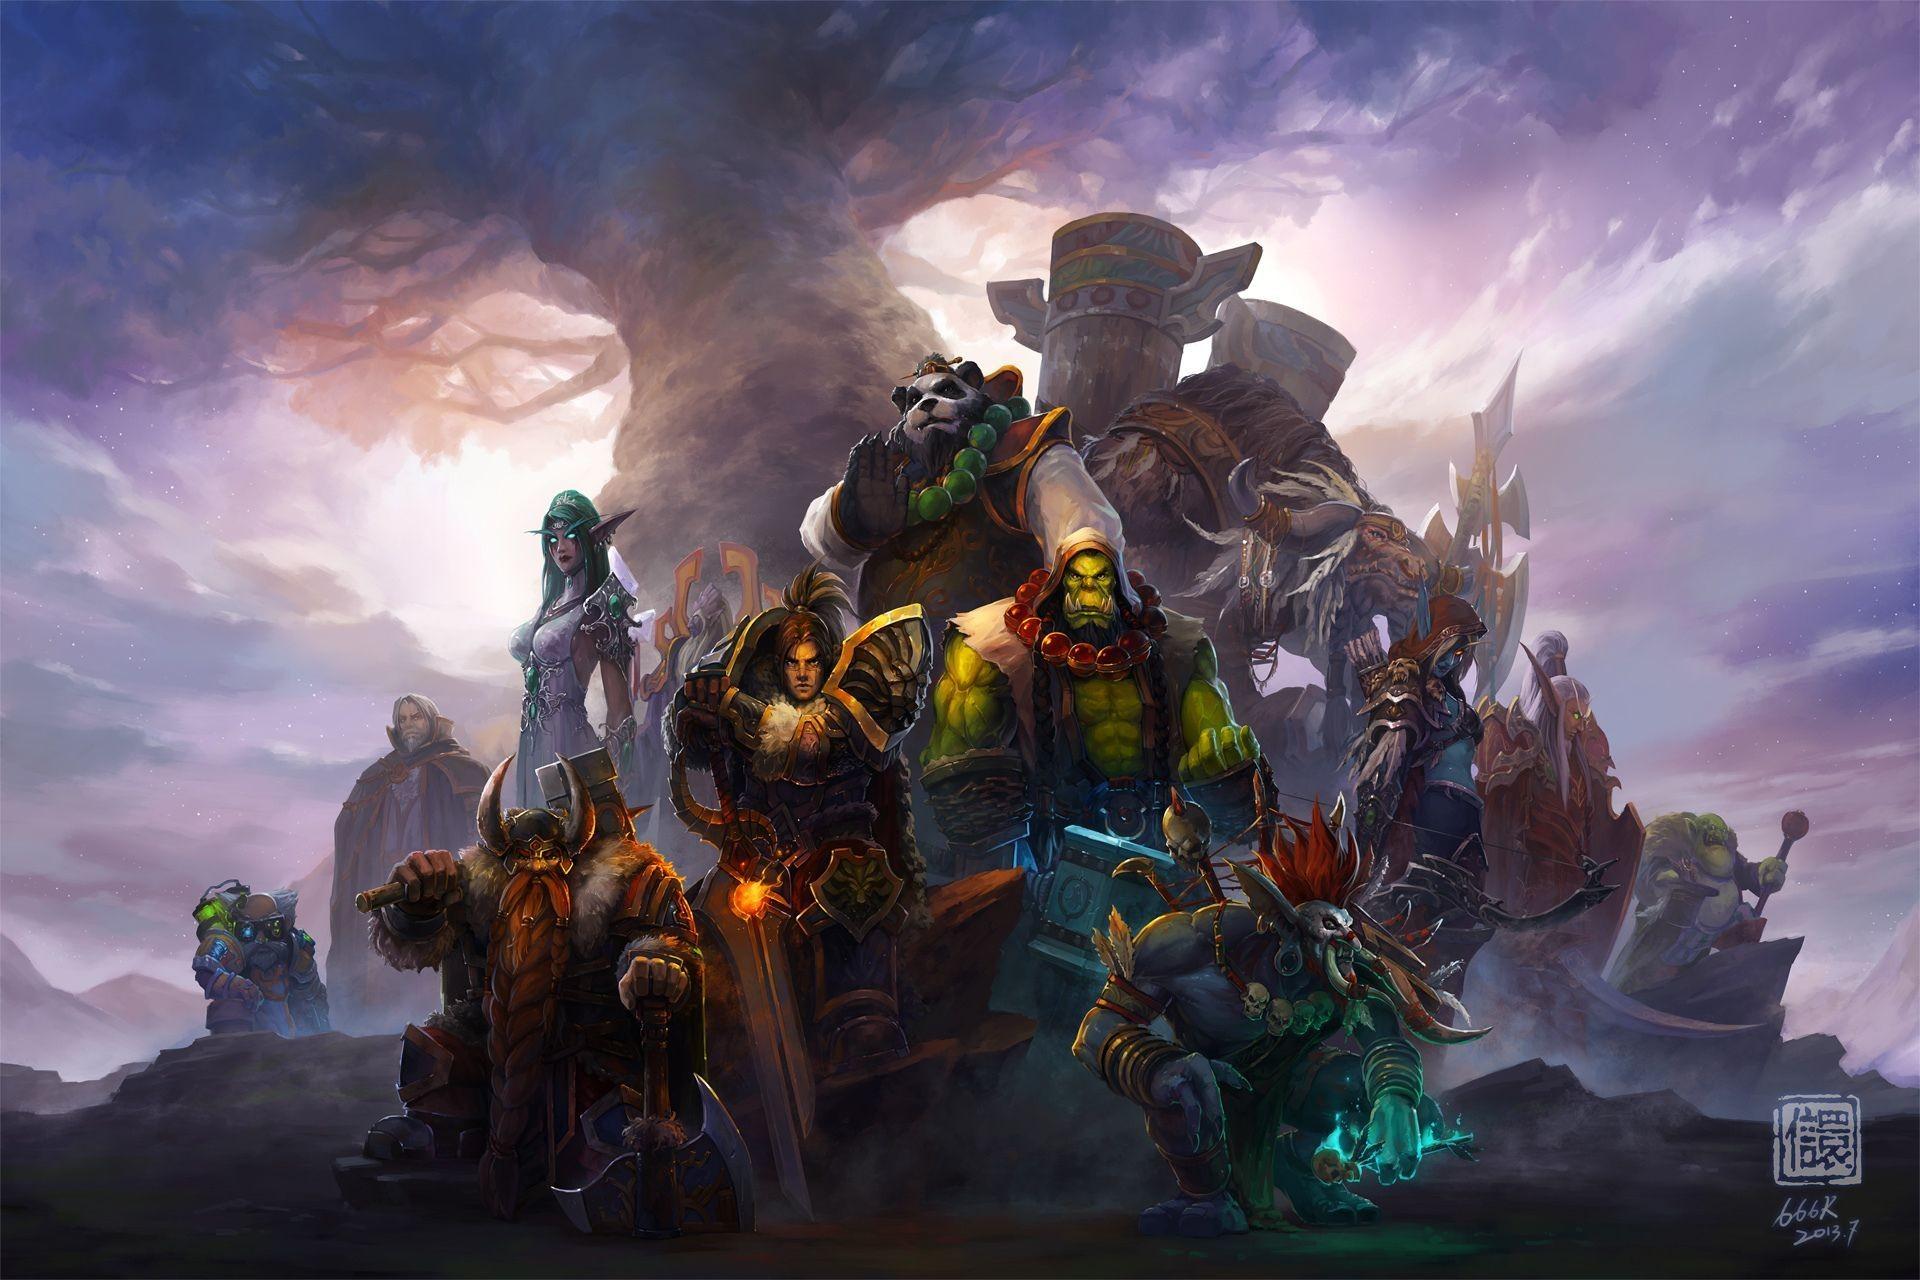 World of WarCraft WoW Orc Warrior Gnome Men Panda Armor Games .